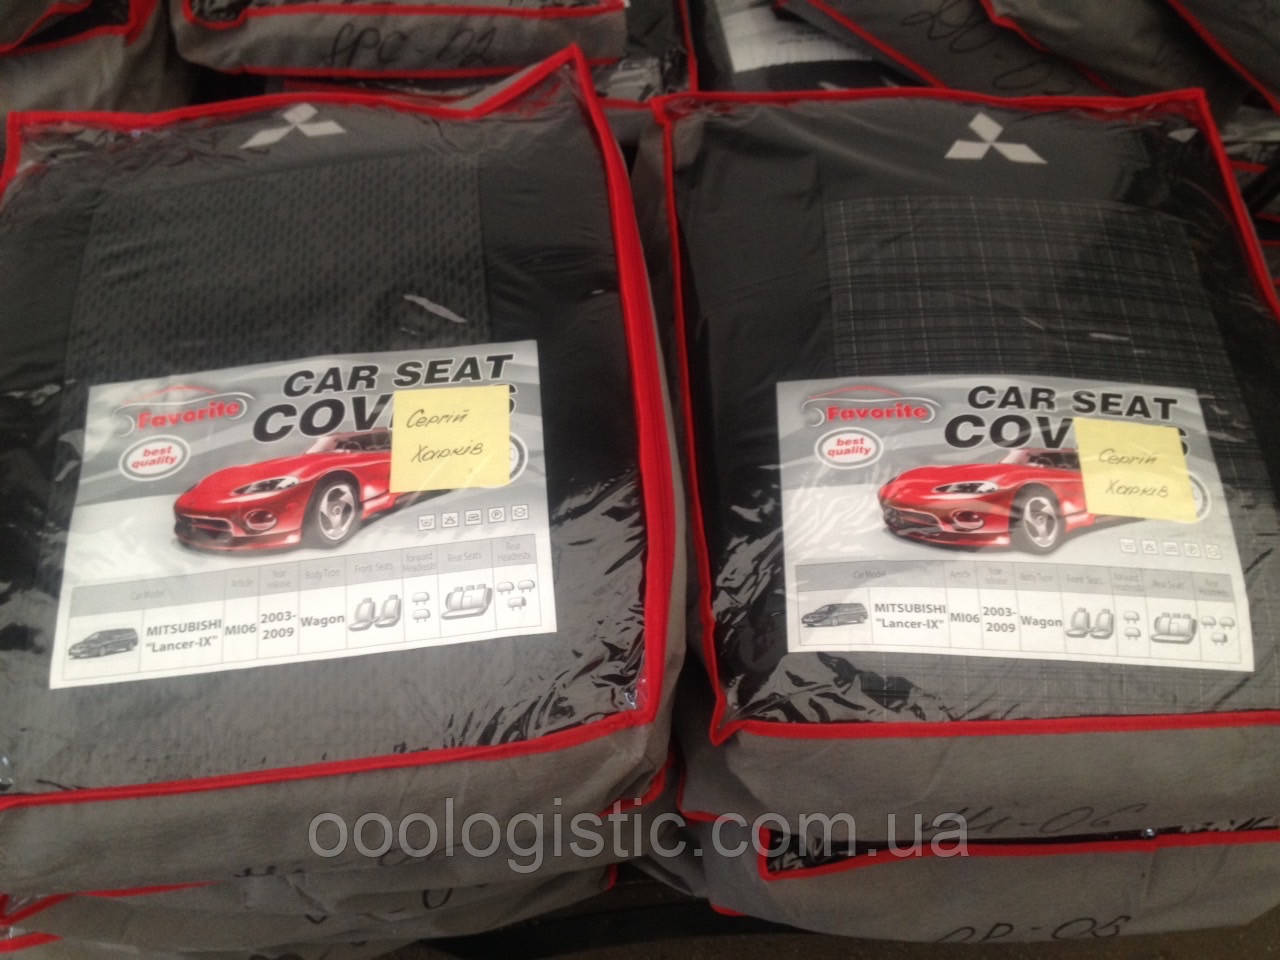 Авточохли Favorite на Mitsubishi Lancer 9 2003-2009 роки вагон модельний комплект